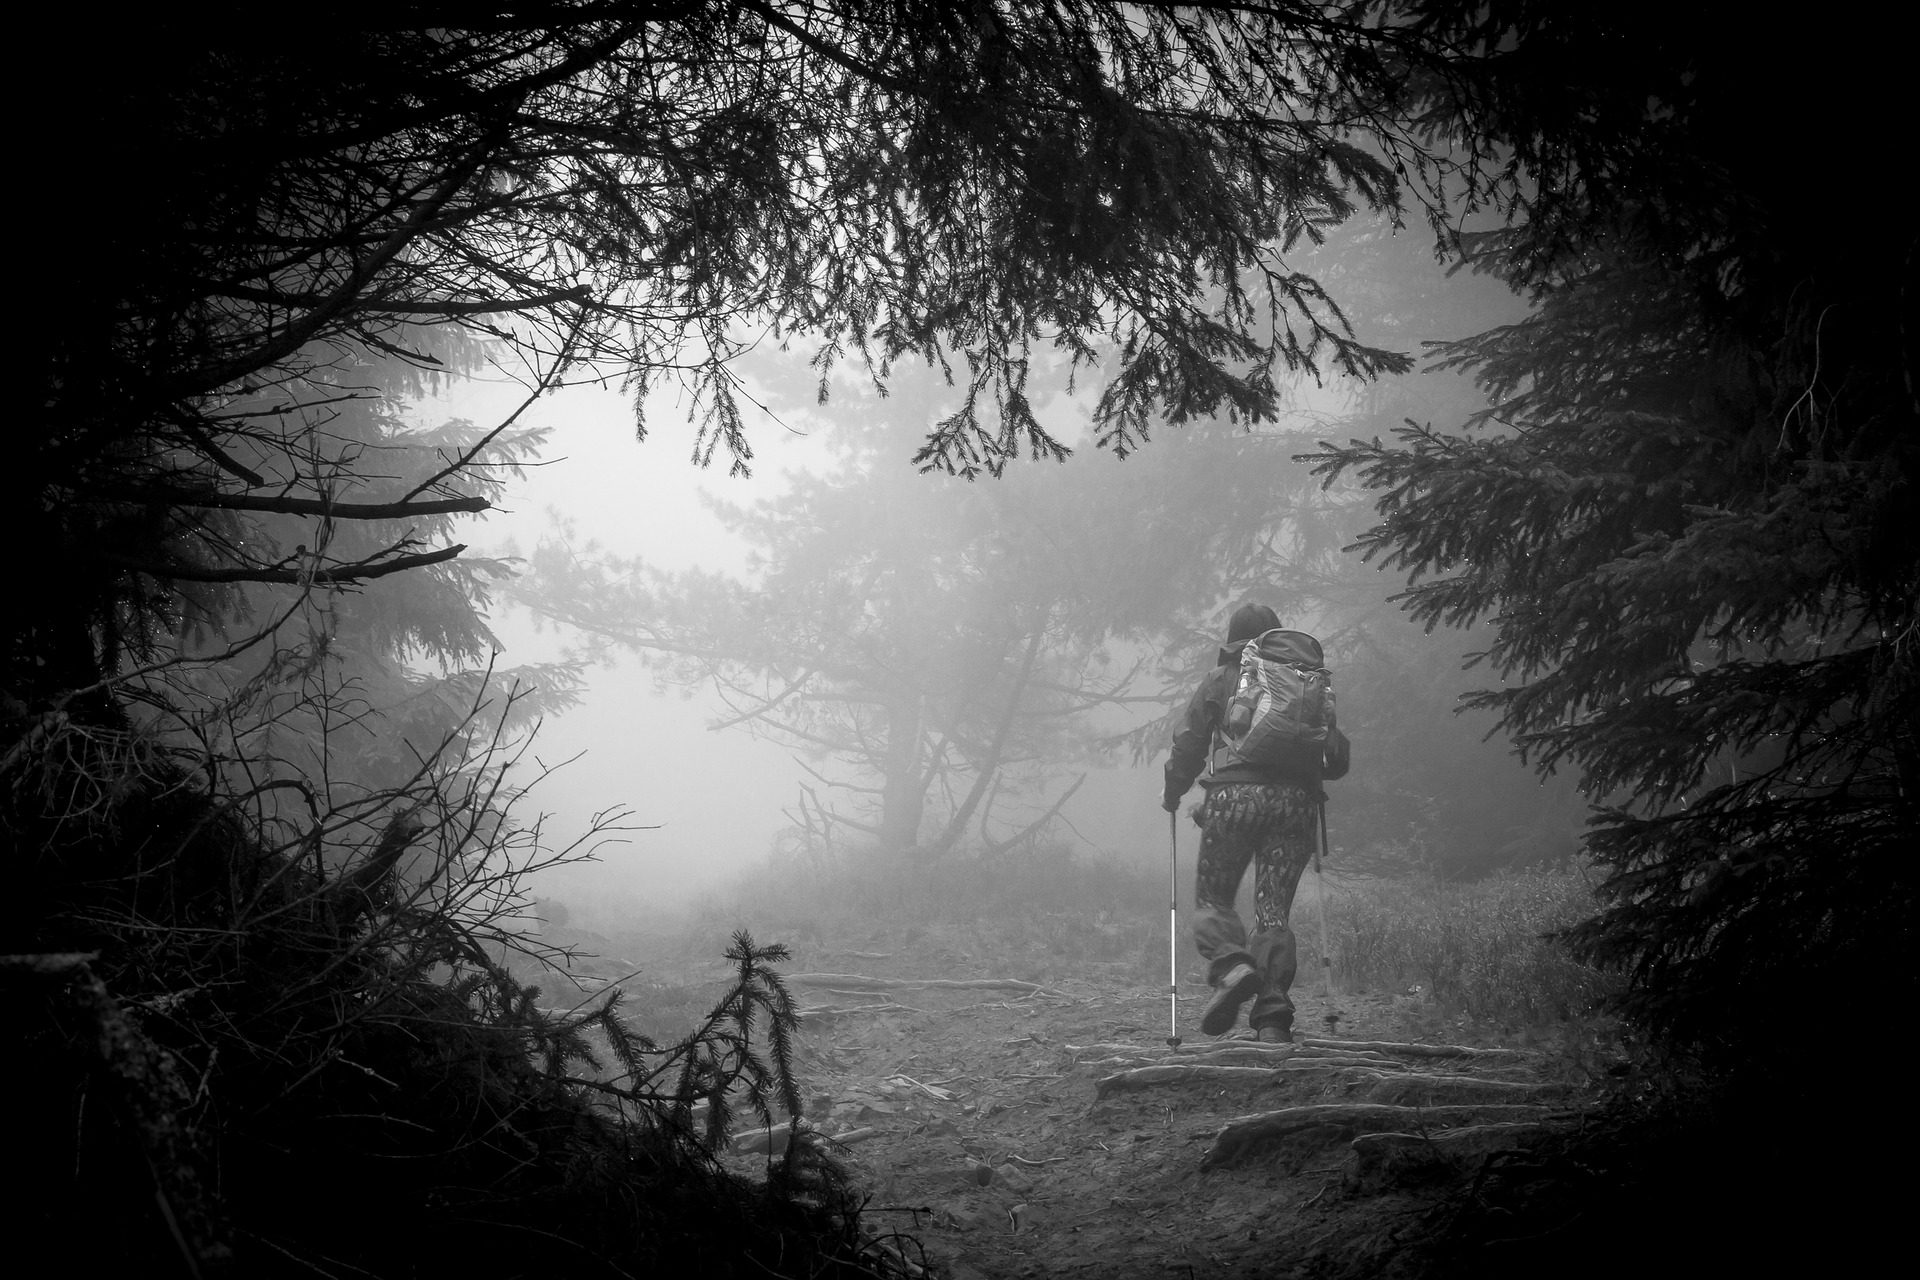 randonneur, Forest, brouillard, ténèbres, en noir et blanc - Fonds d'écran HD - Professor-falken.com